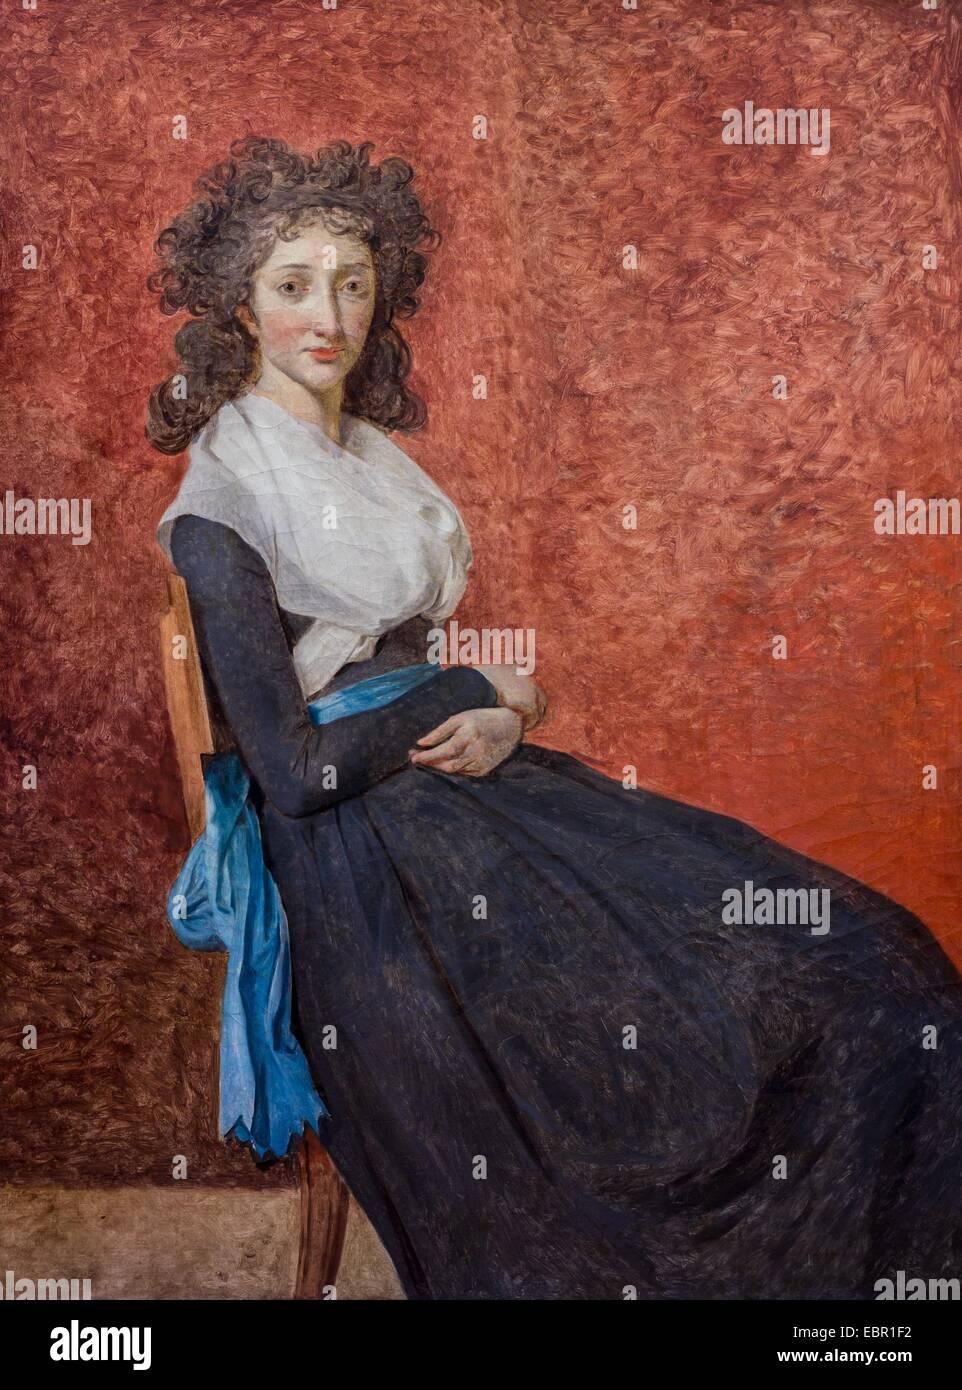 ActiveMuseum_0001843.jpg / Madam Charles-Louis Trudaine, 1792 - Jacques-Louis David Oil on canvas 25/09/2013  - - Stock Image